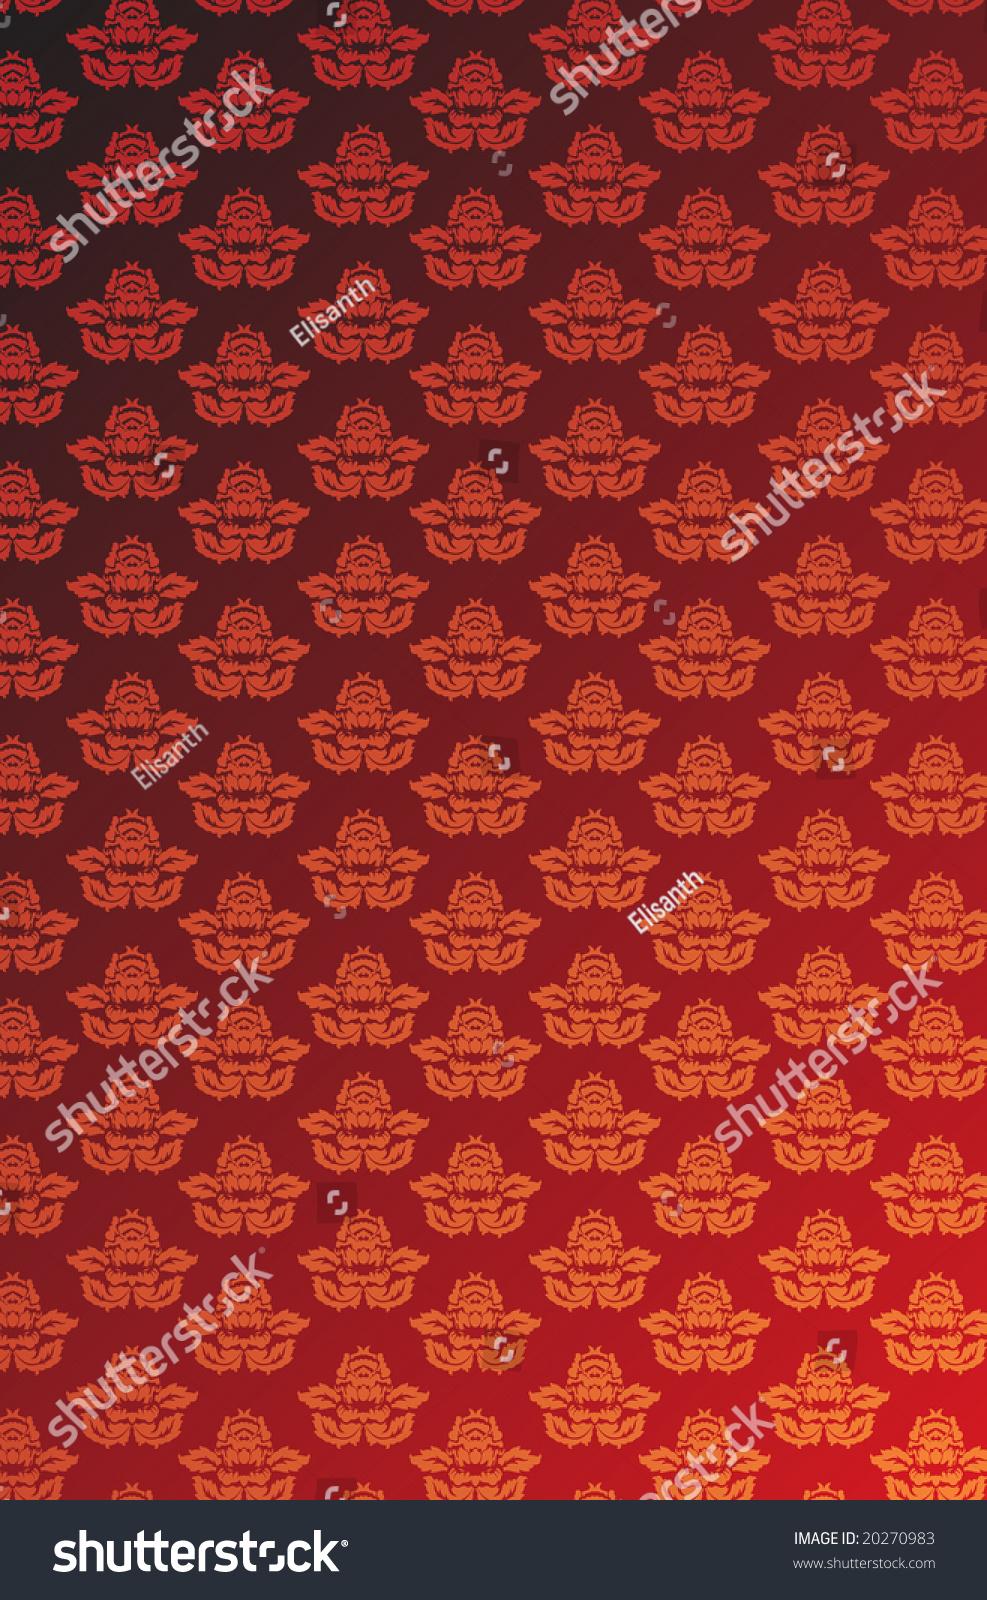 vector red gold glamour wallpaper stock vector 20270983 - shutterstock